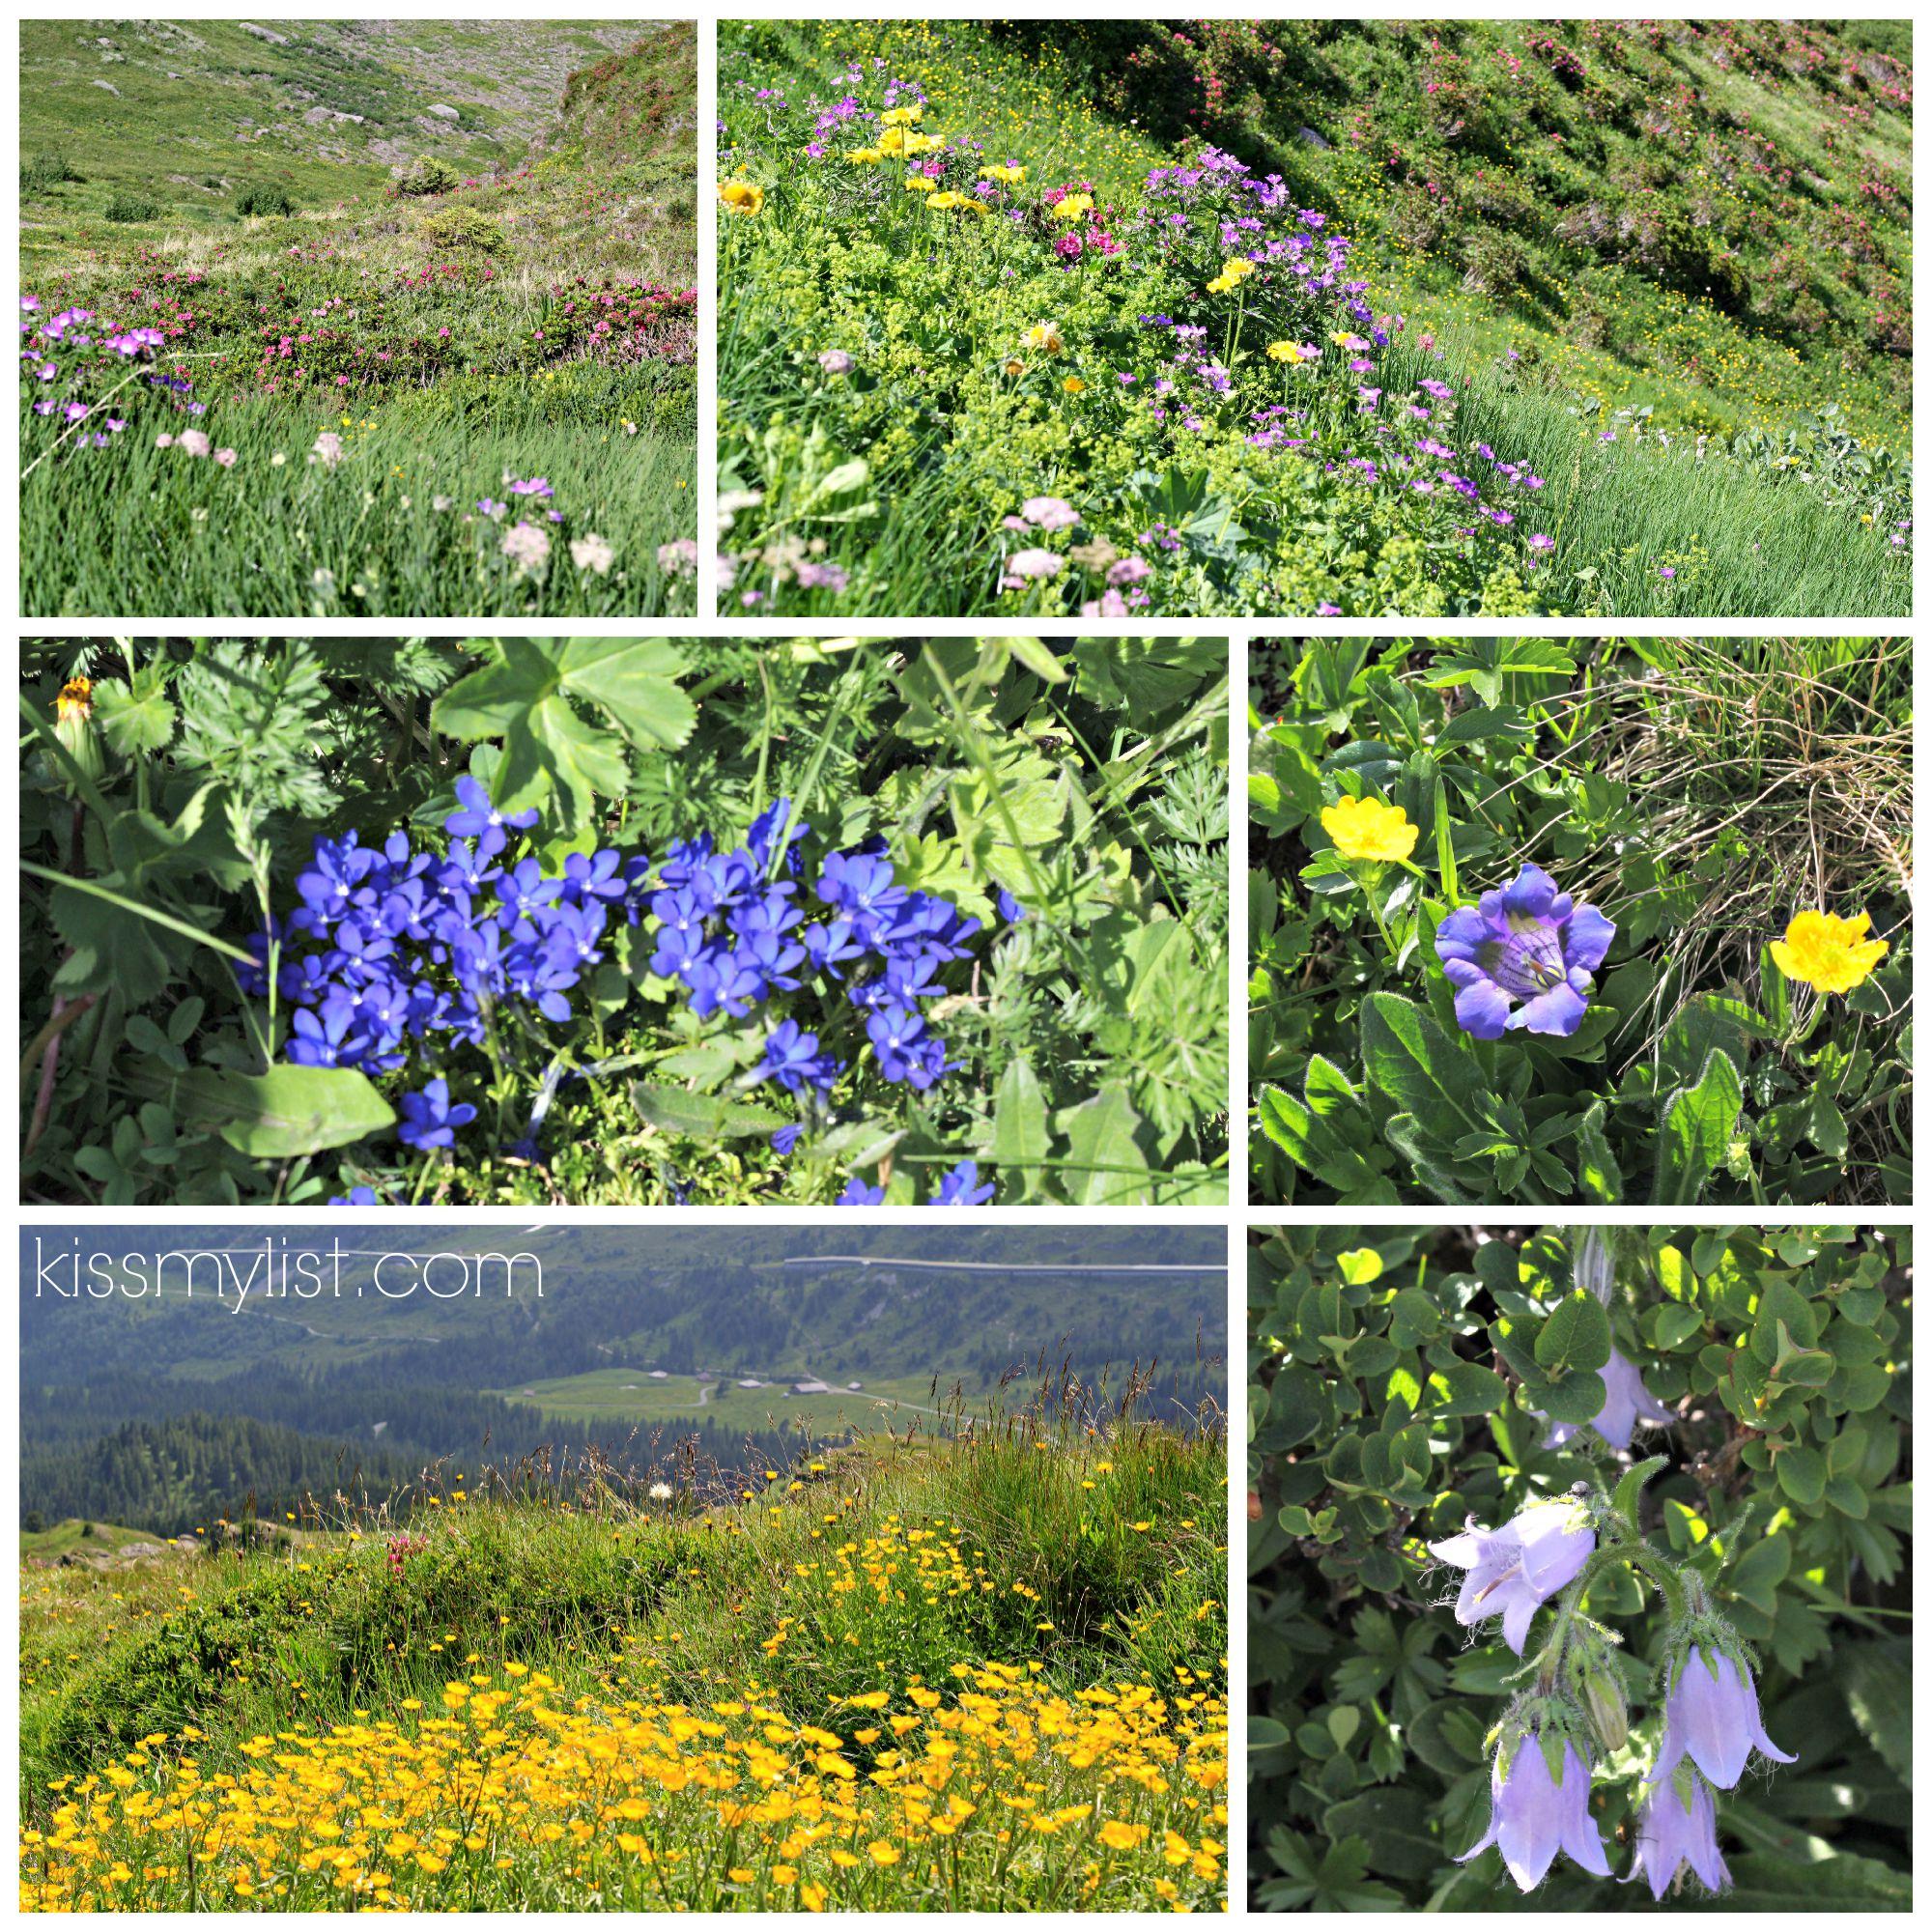 Flowers of Swiss Alps